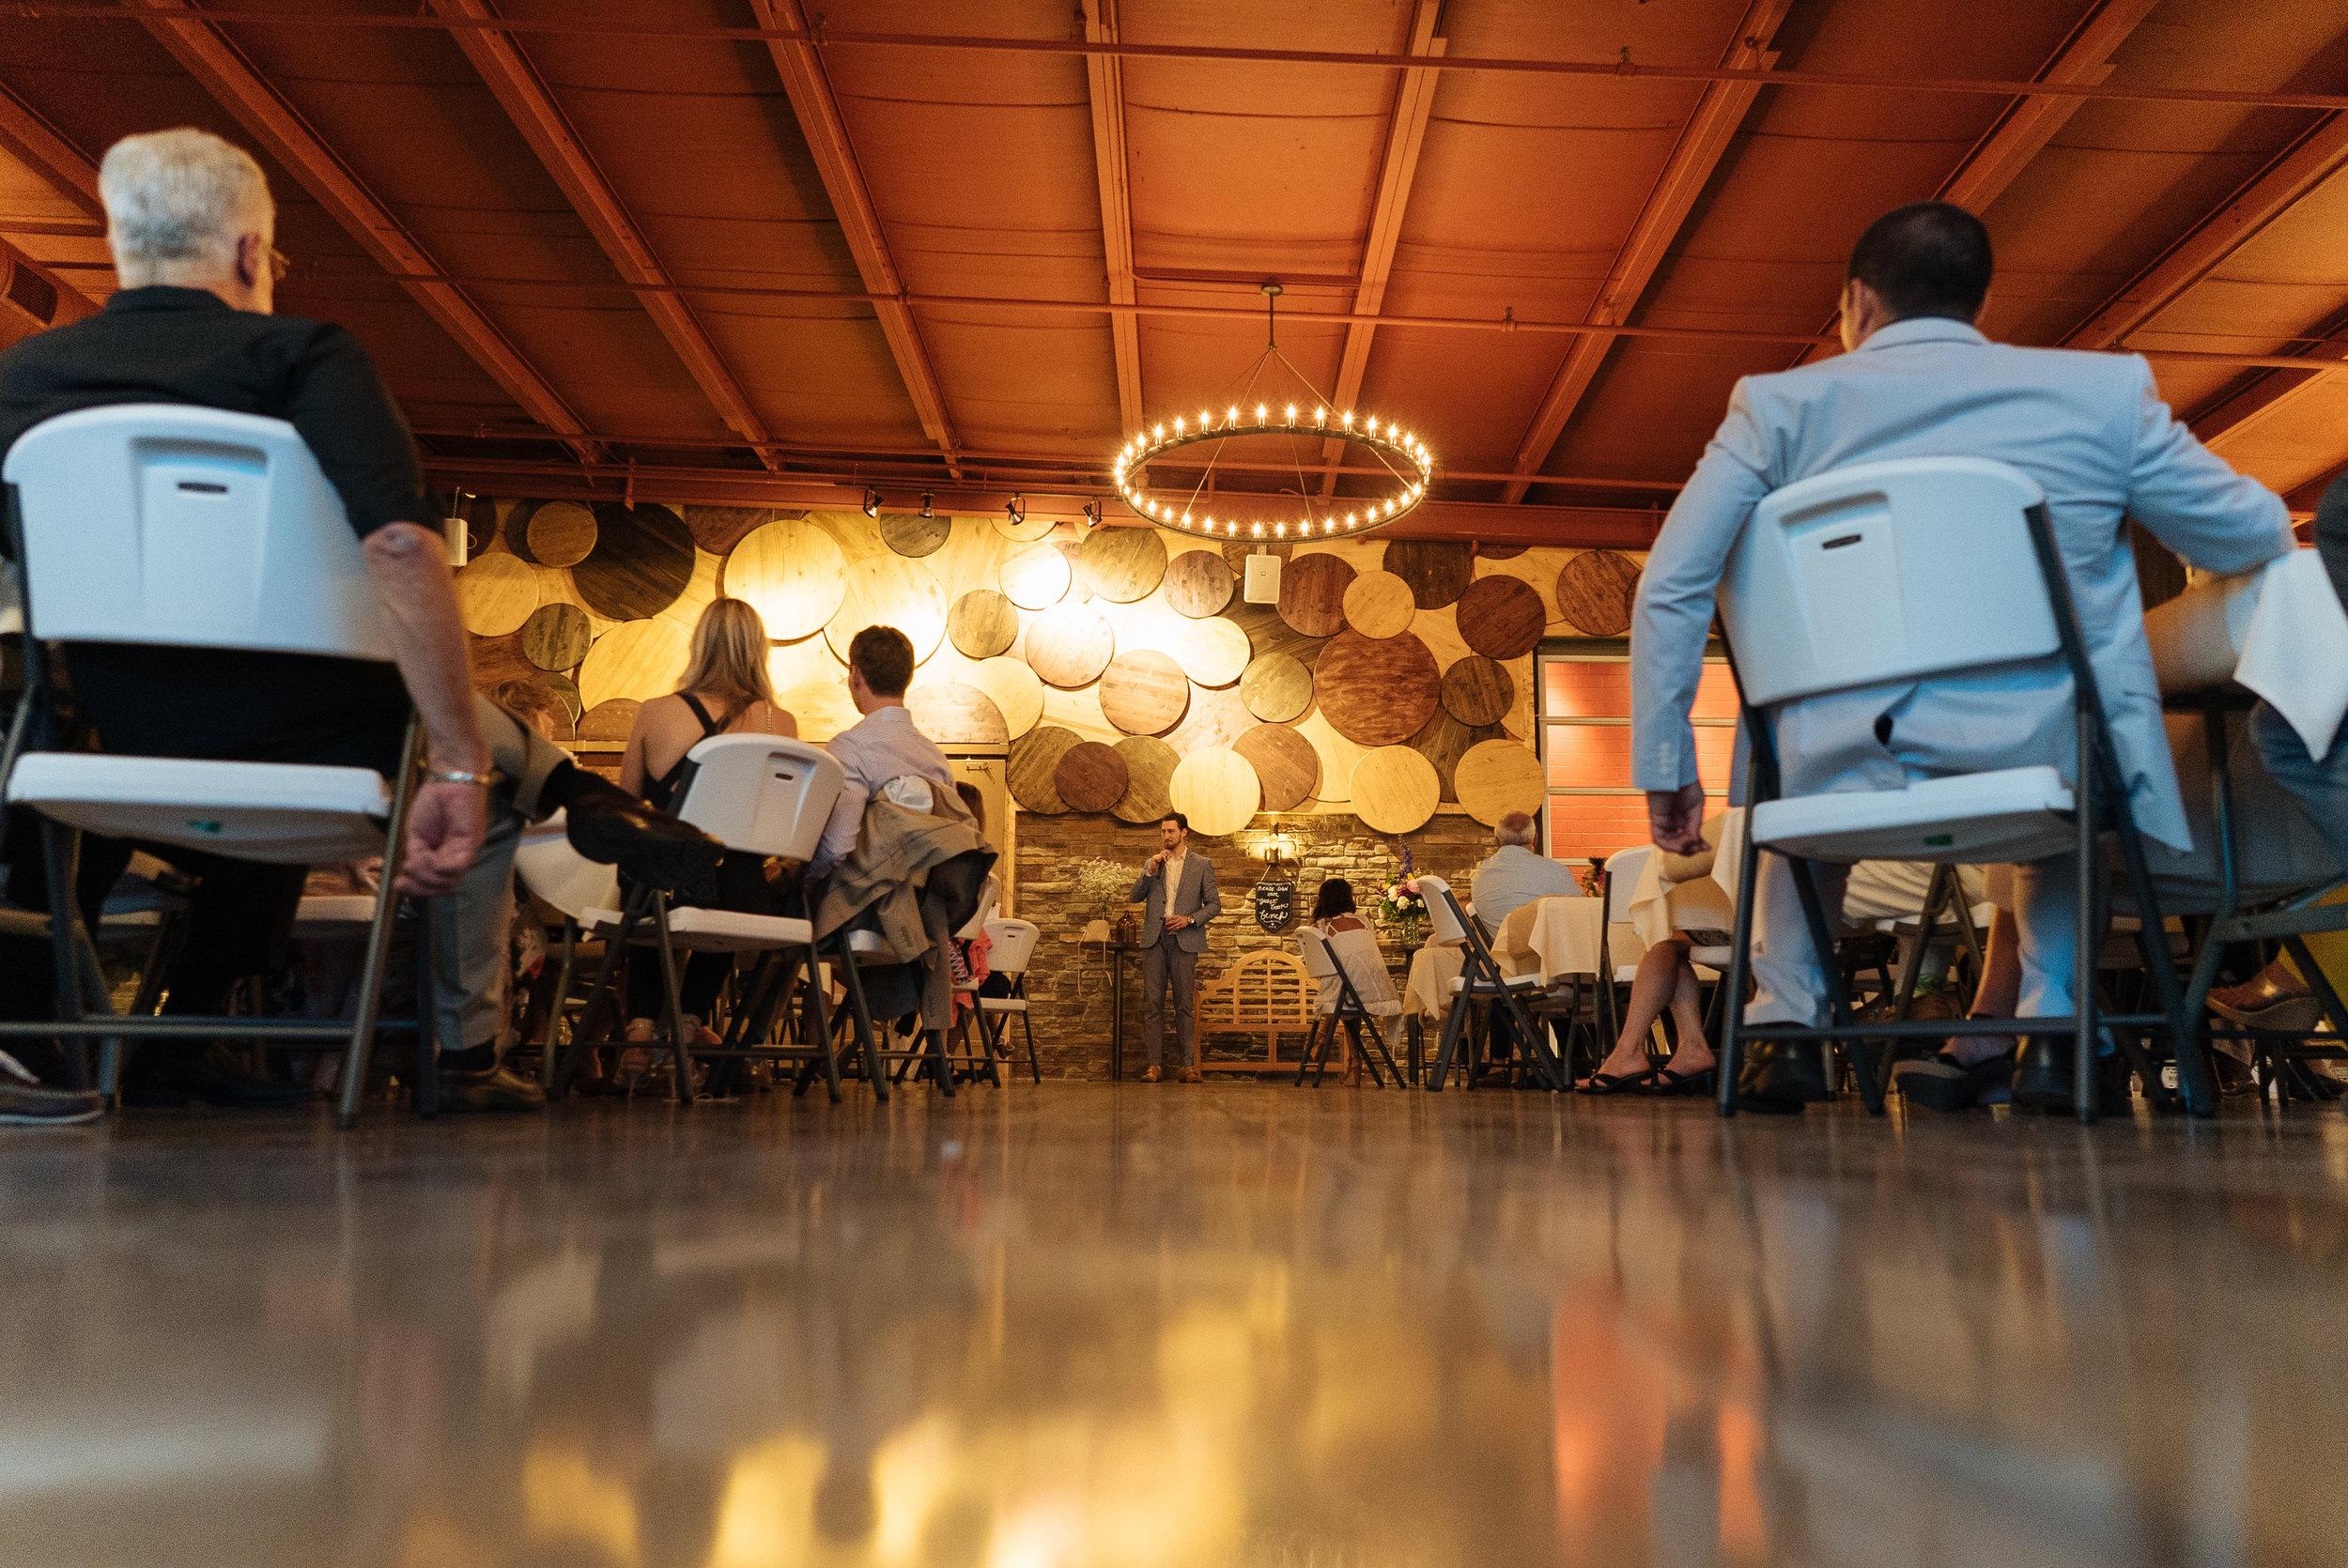 receptionhall-3.jpg